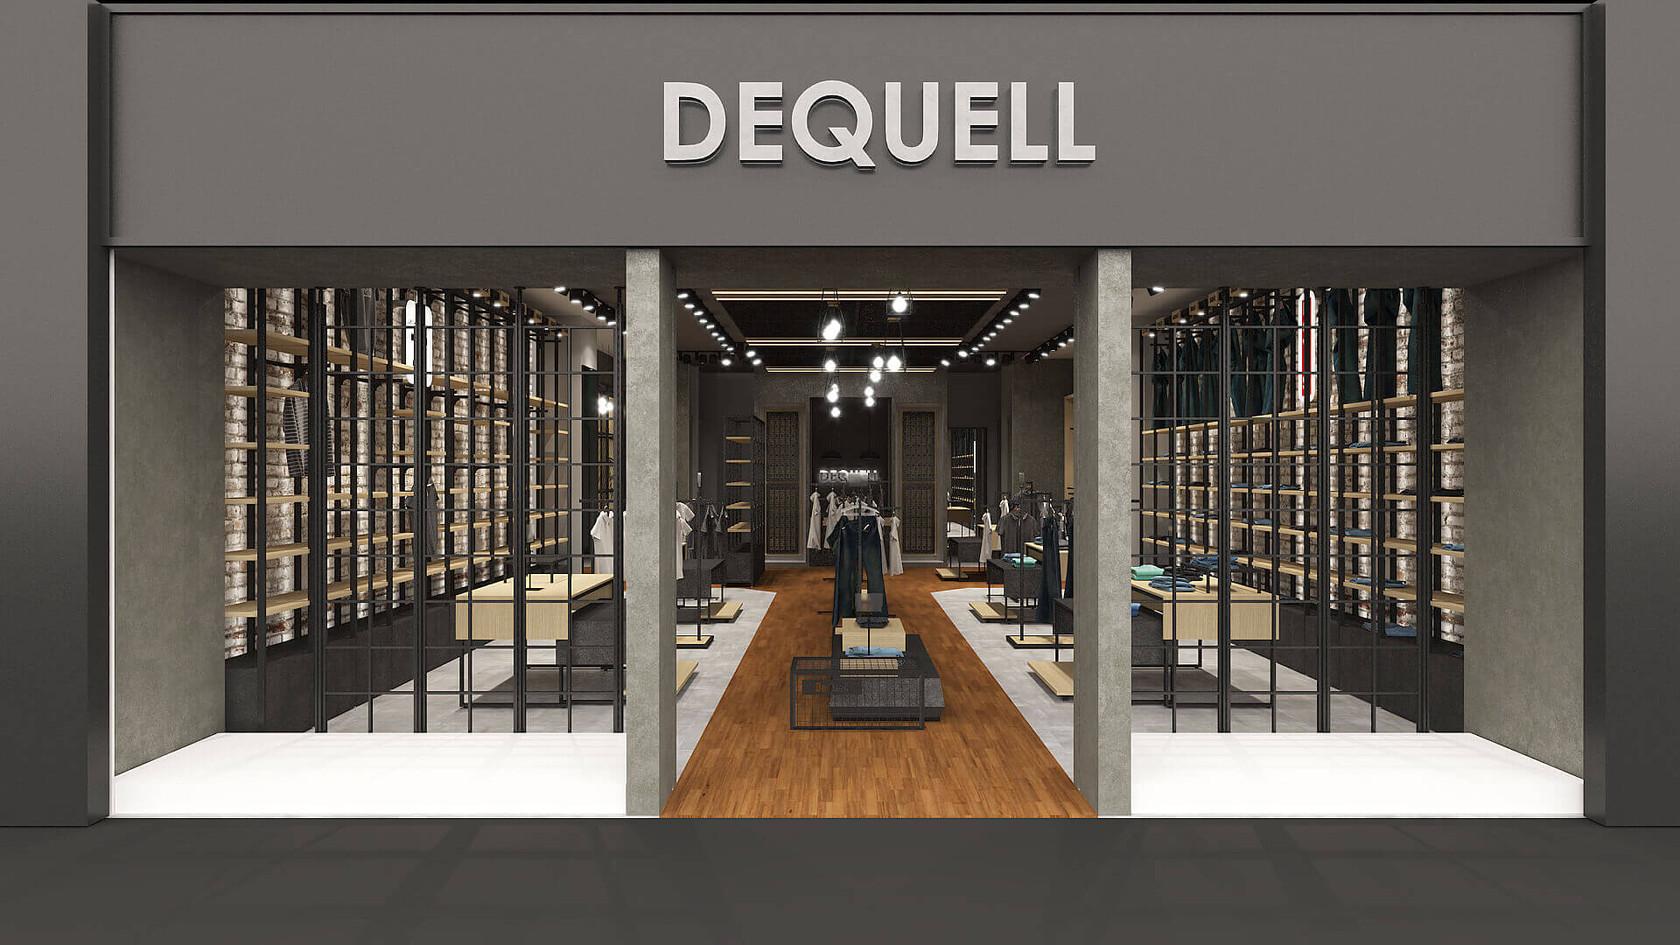 Denim Mağazası Tasarımları | Shopline Mağaza Dekorasyonu | Dequell